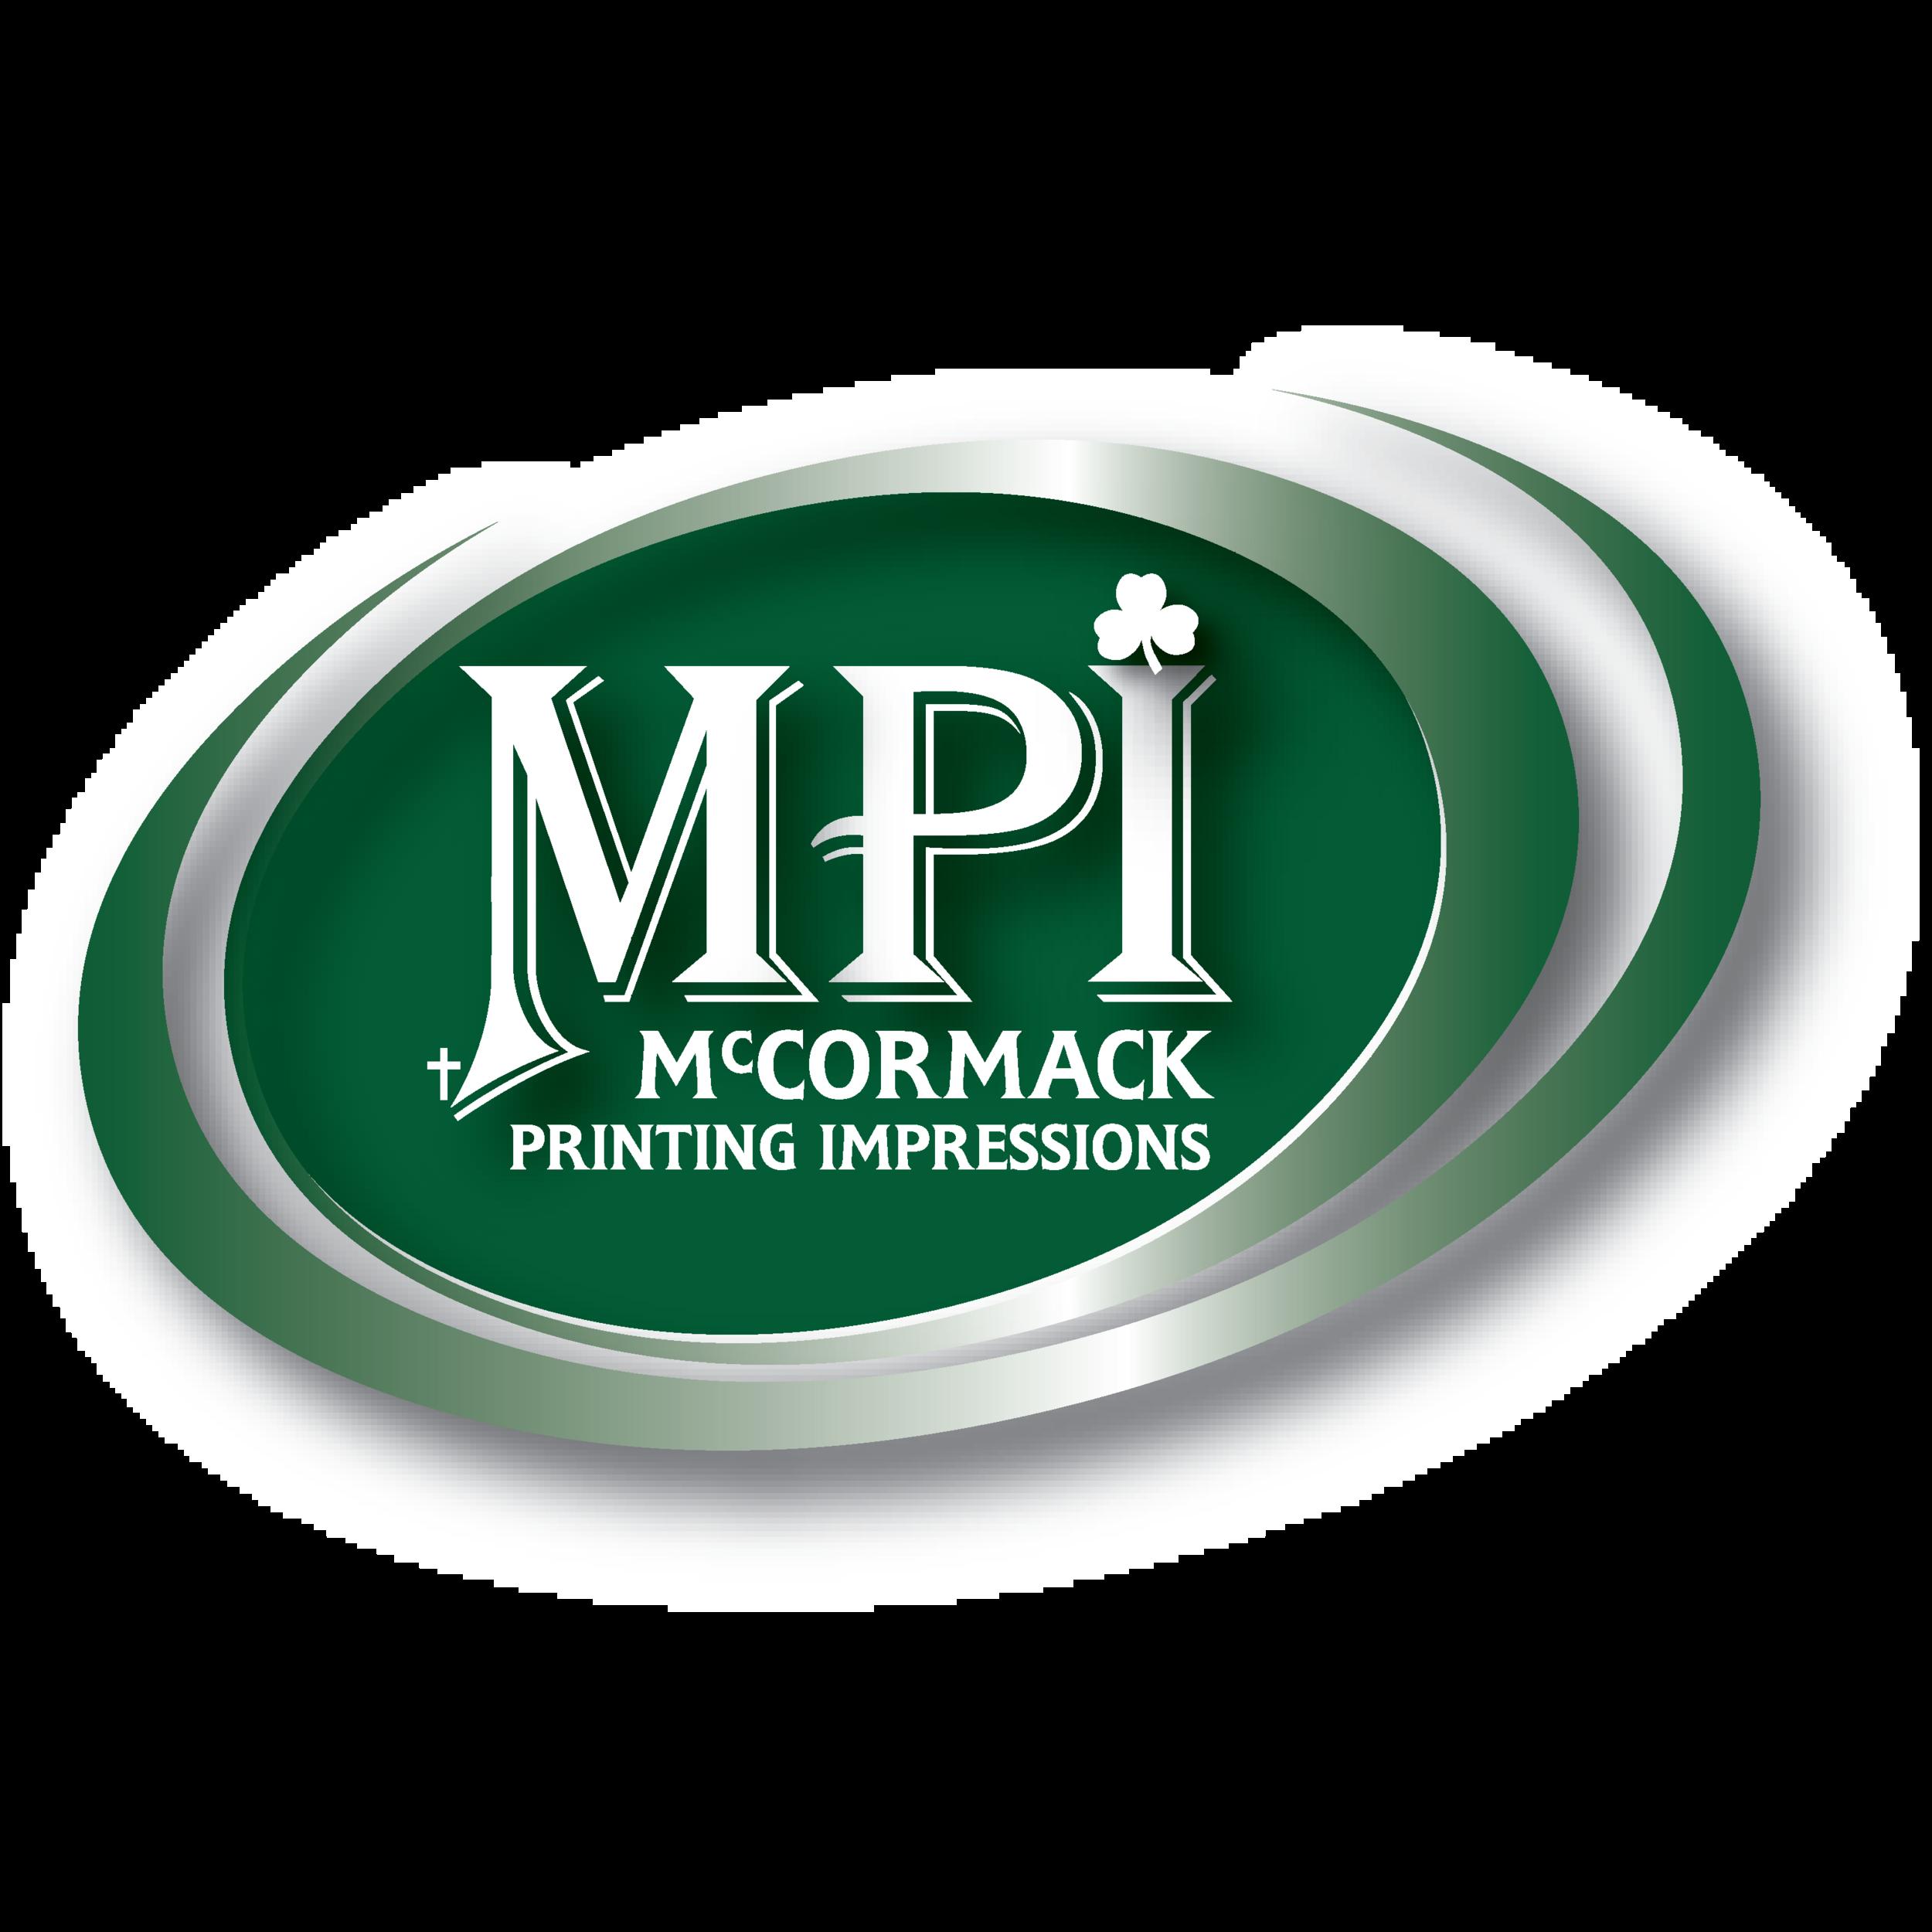 McCormack Printing Impressions